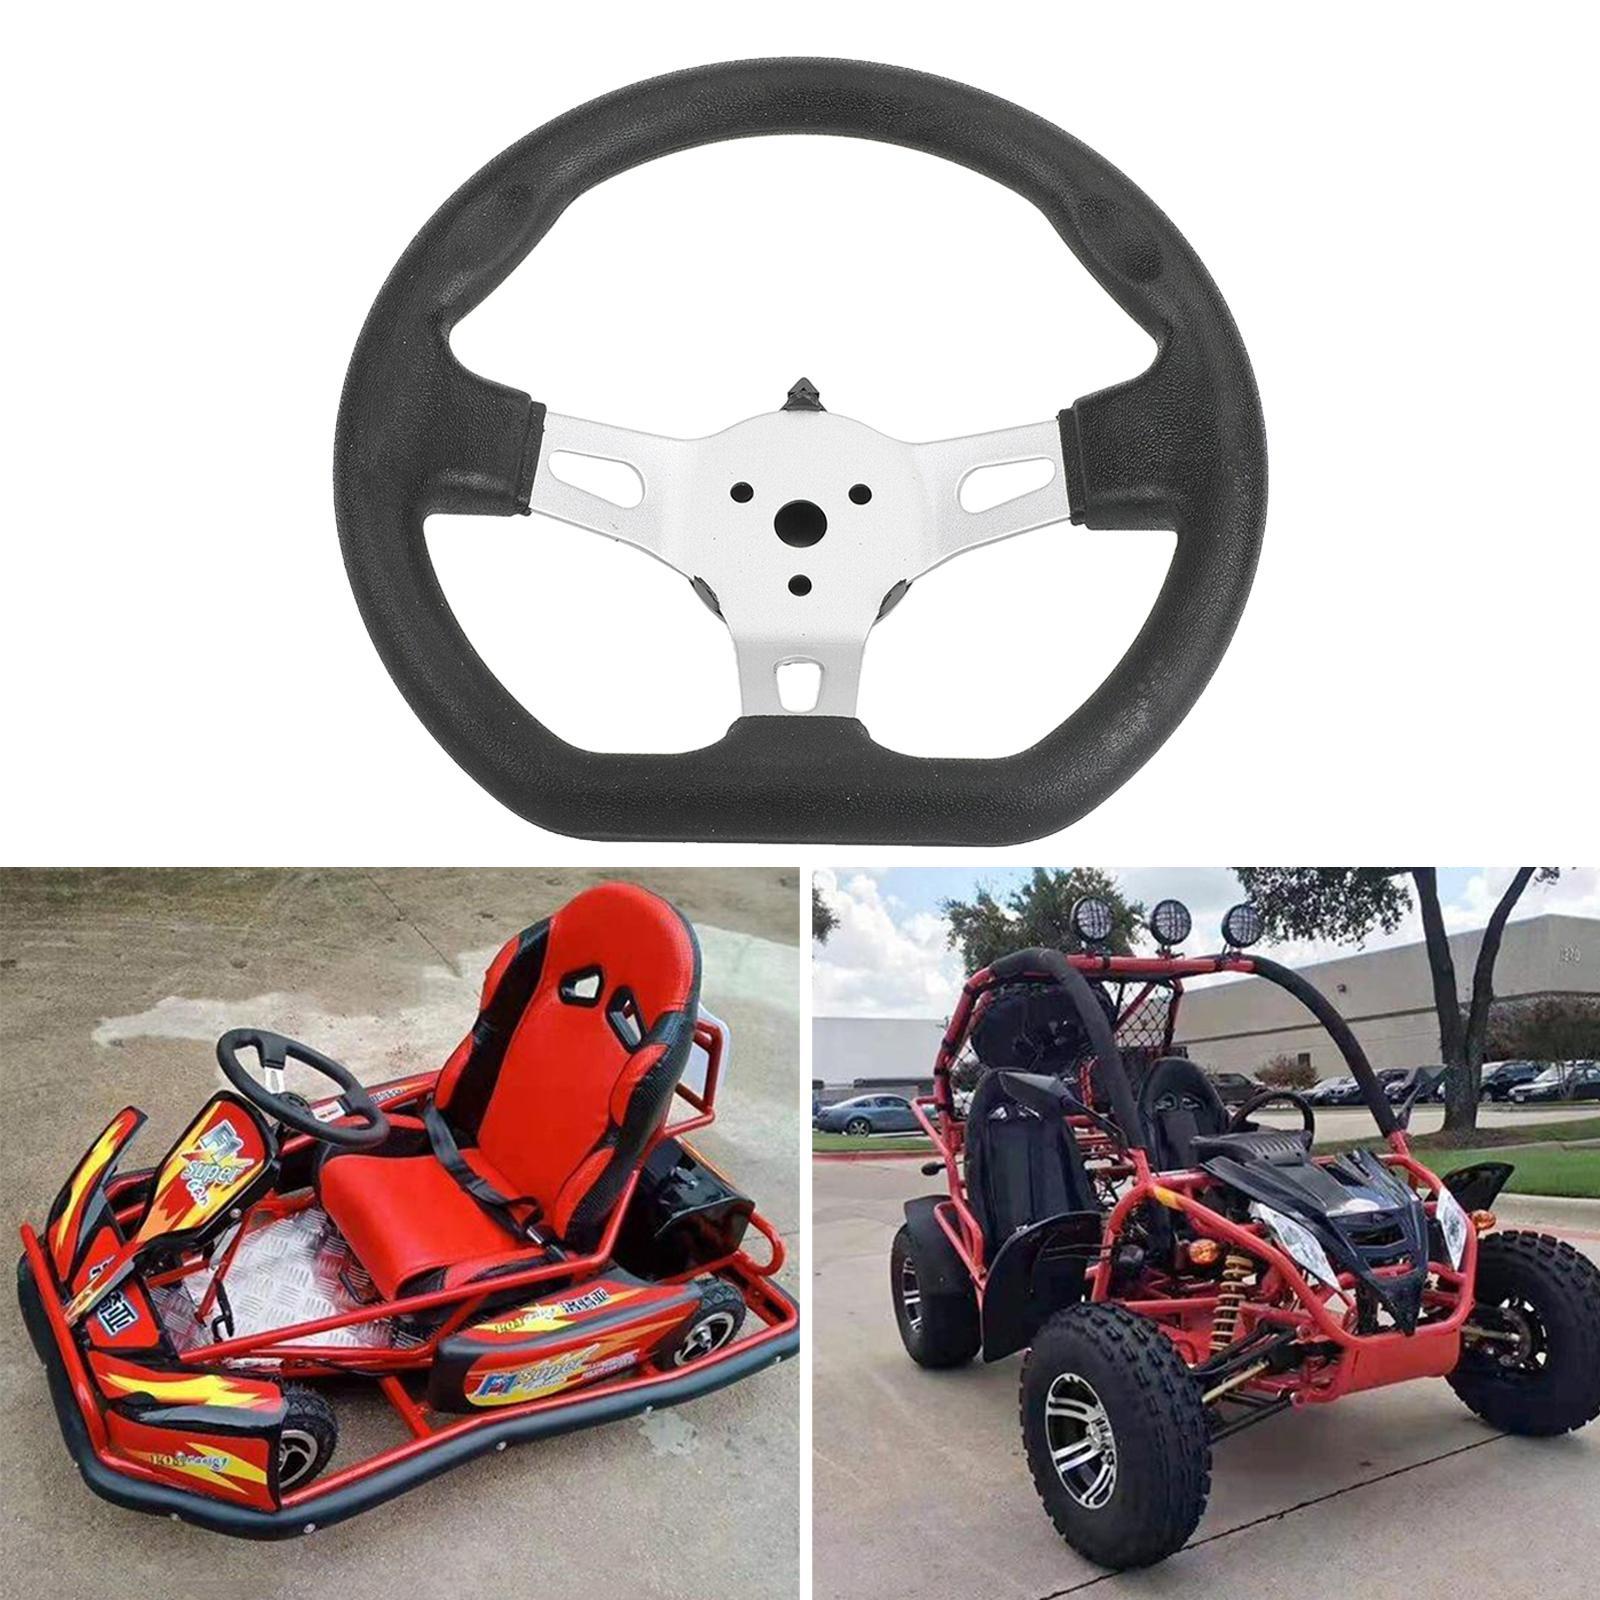 270MM clásico volante de Playa Kart Go Kart Accesorios Buggy Parte - Negro